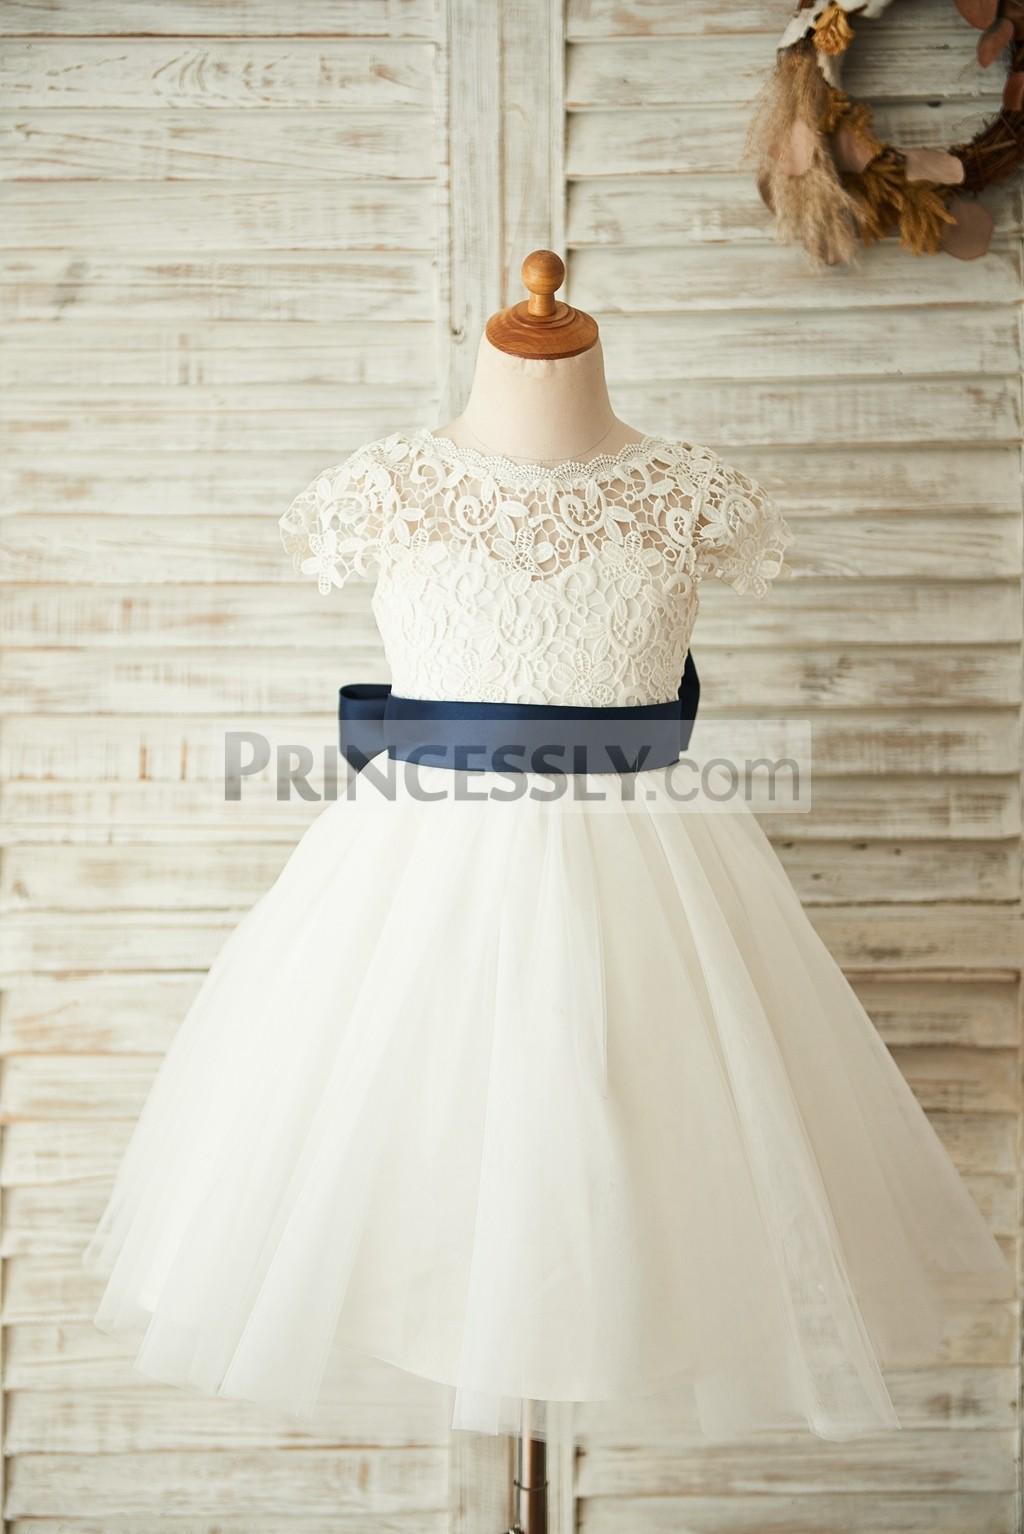 Short sleeves lace overlay tulle ivory princess flower girl dress